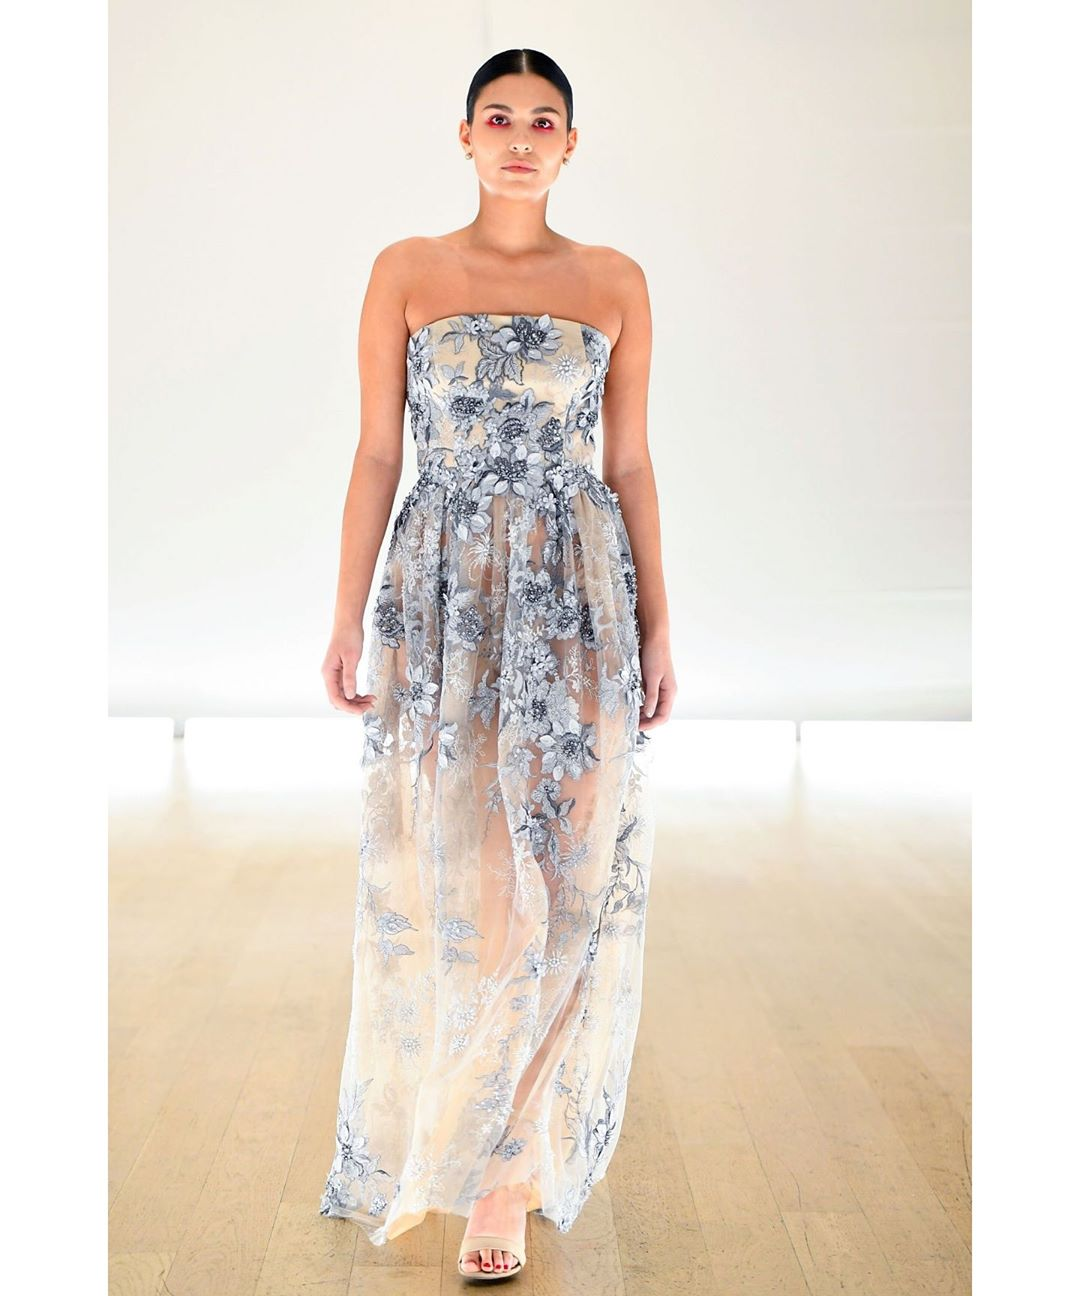 Toronto Fashion Week 2019 || Designer:  @lesley_hampton   MUA:  @patrickryanmua   Photographer:  @georgepimentel1